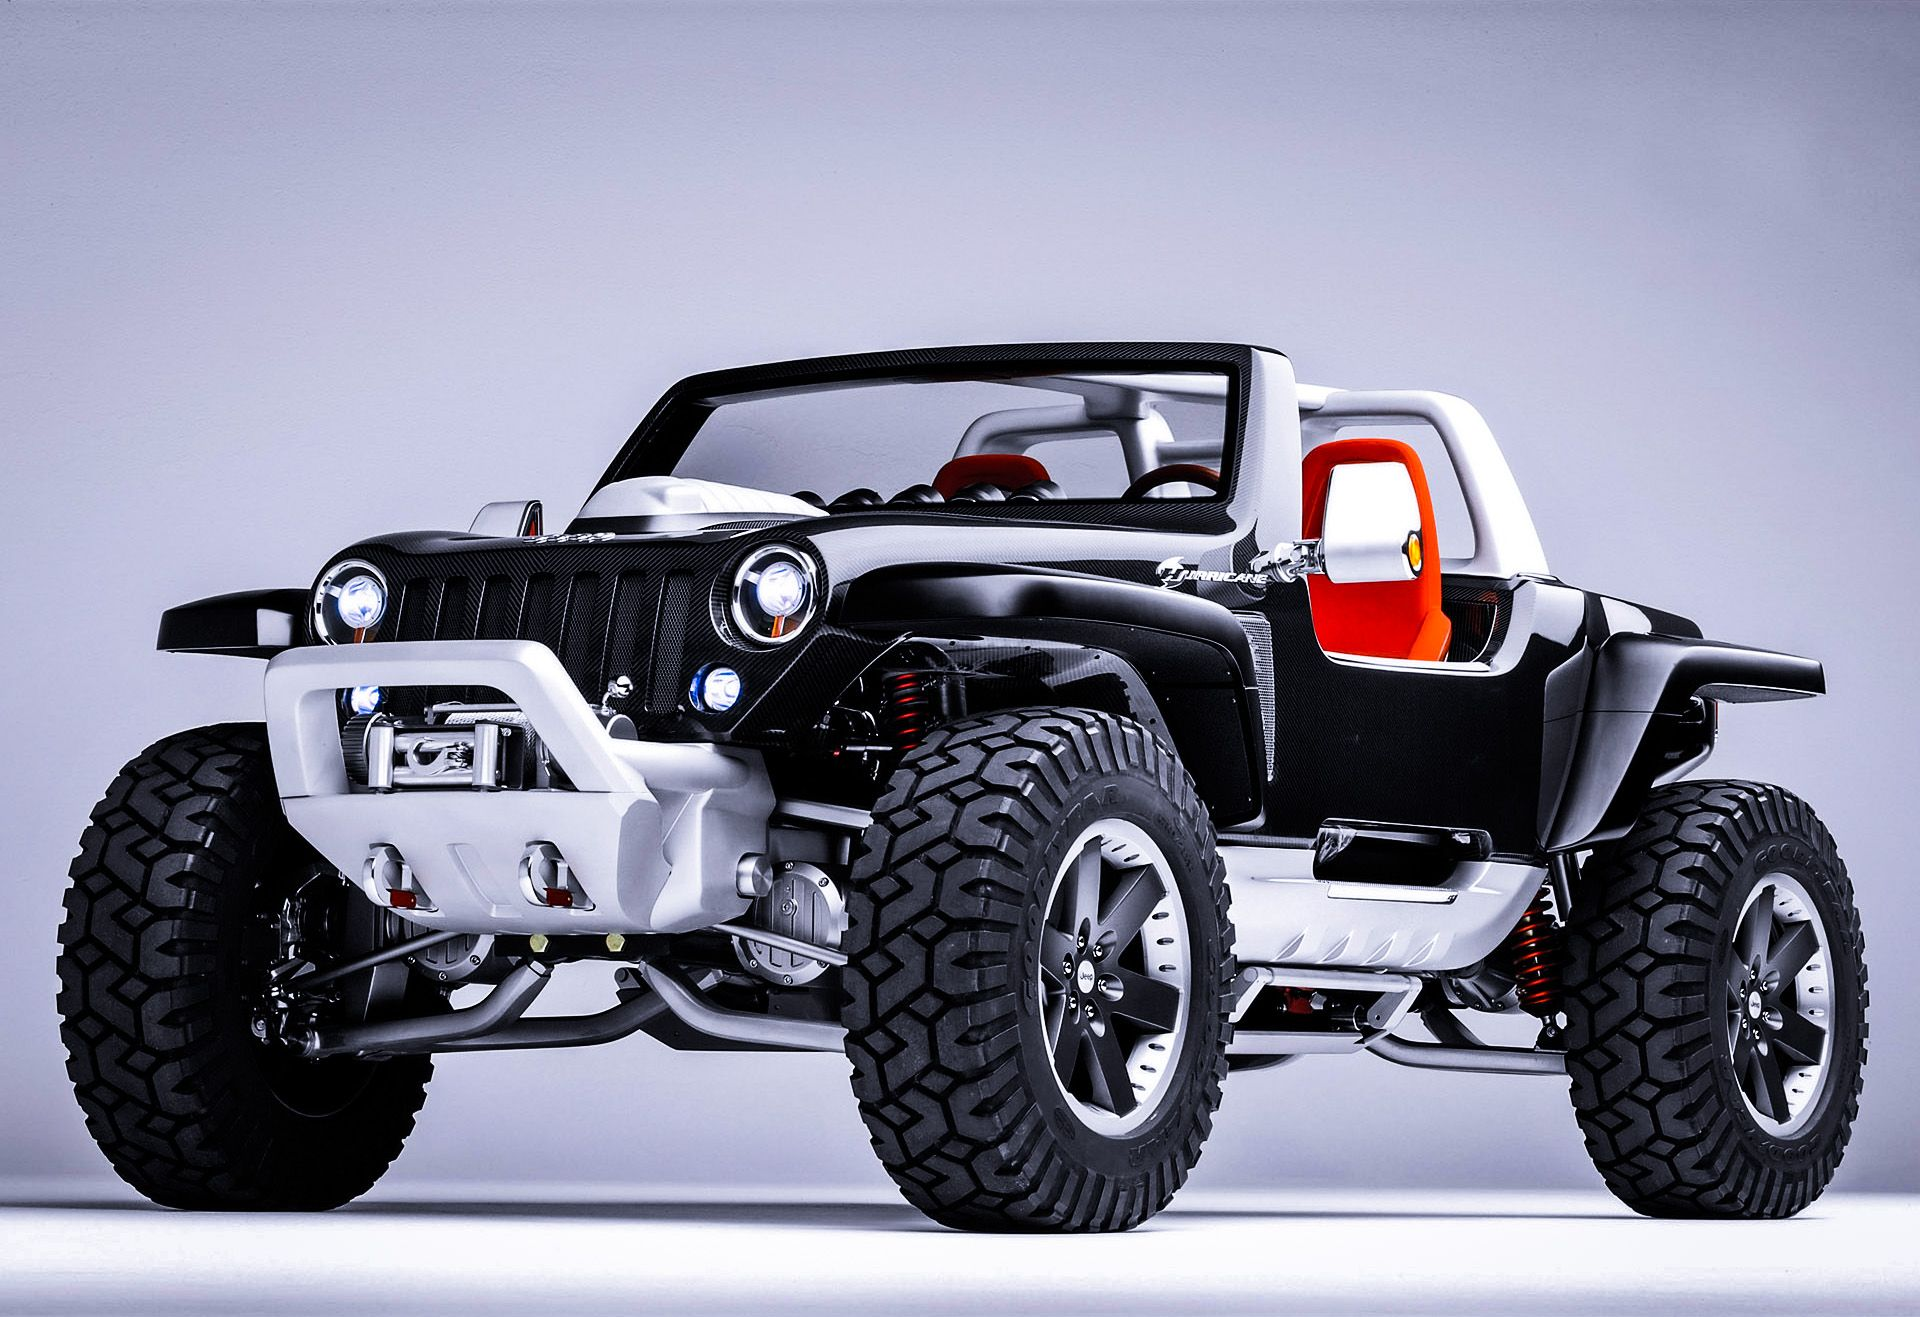 Jeep Wrangler Hurricane Http Jeep Com Jeep Life News Jeep Hurricane Concept Html Jeep Cars Jeep Jeep Concept